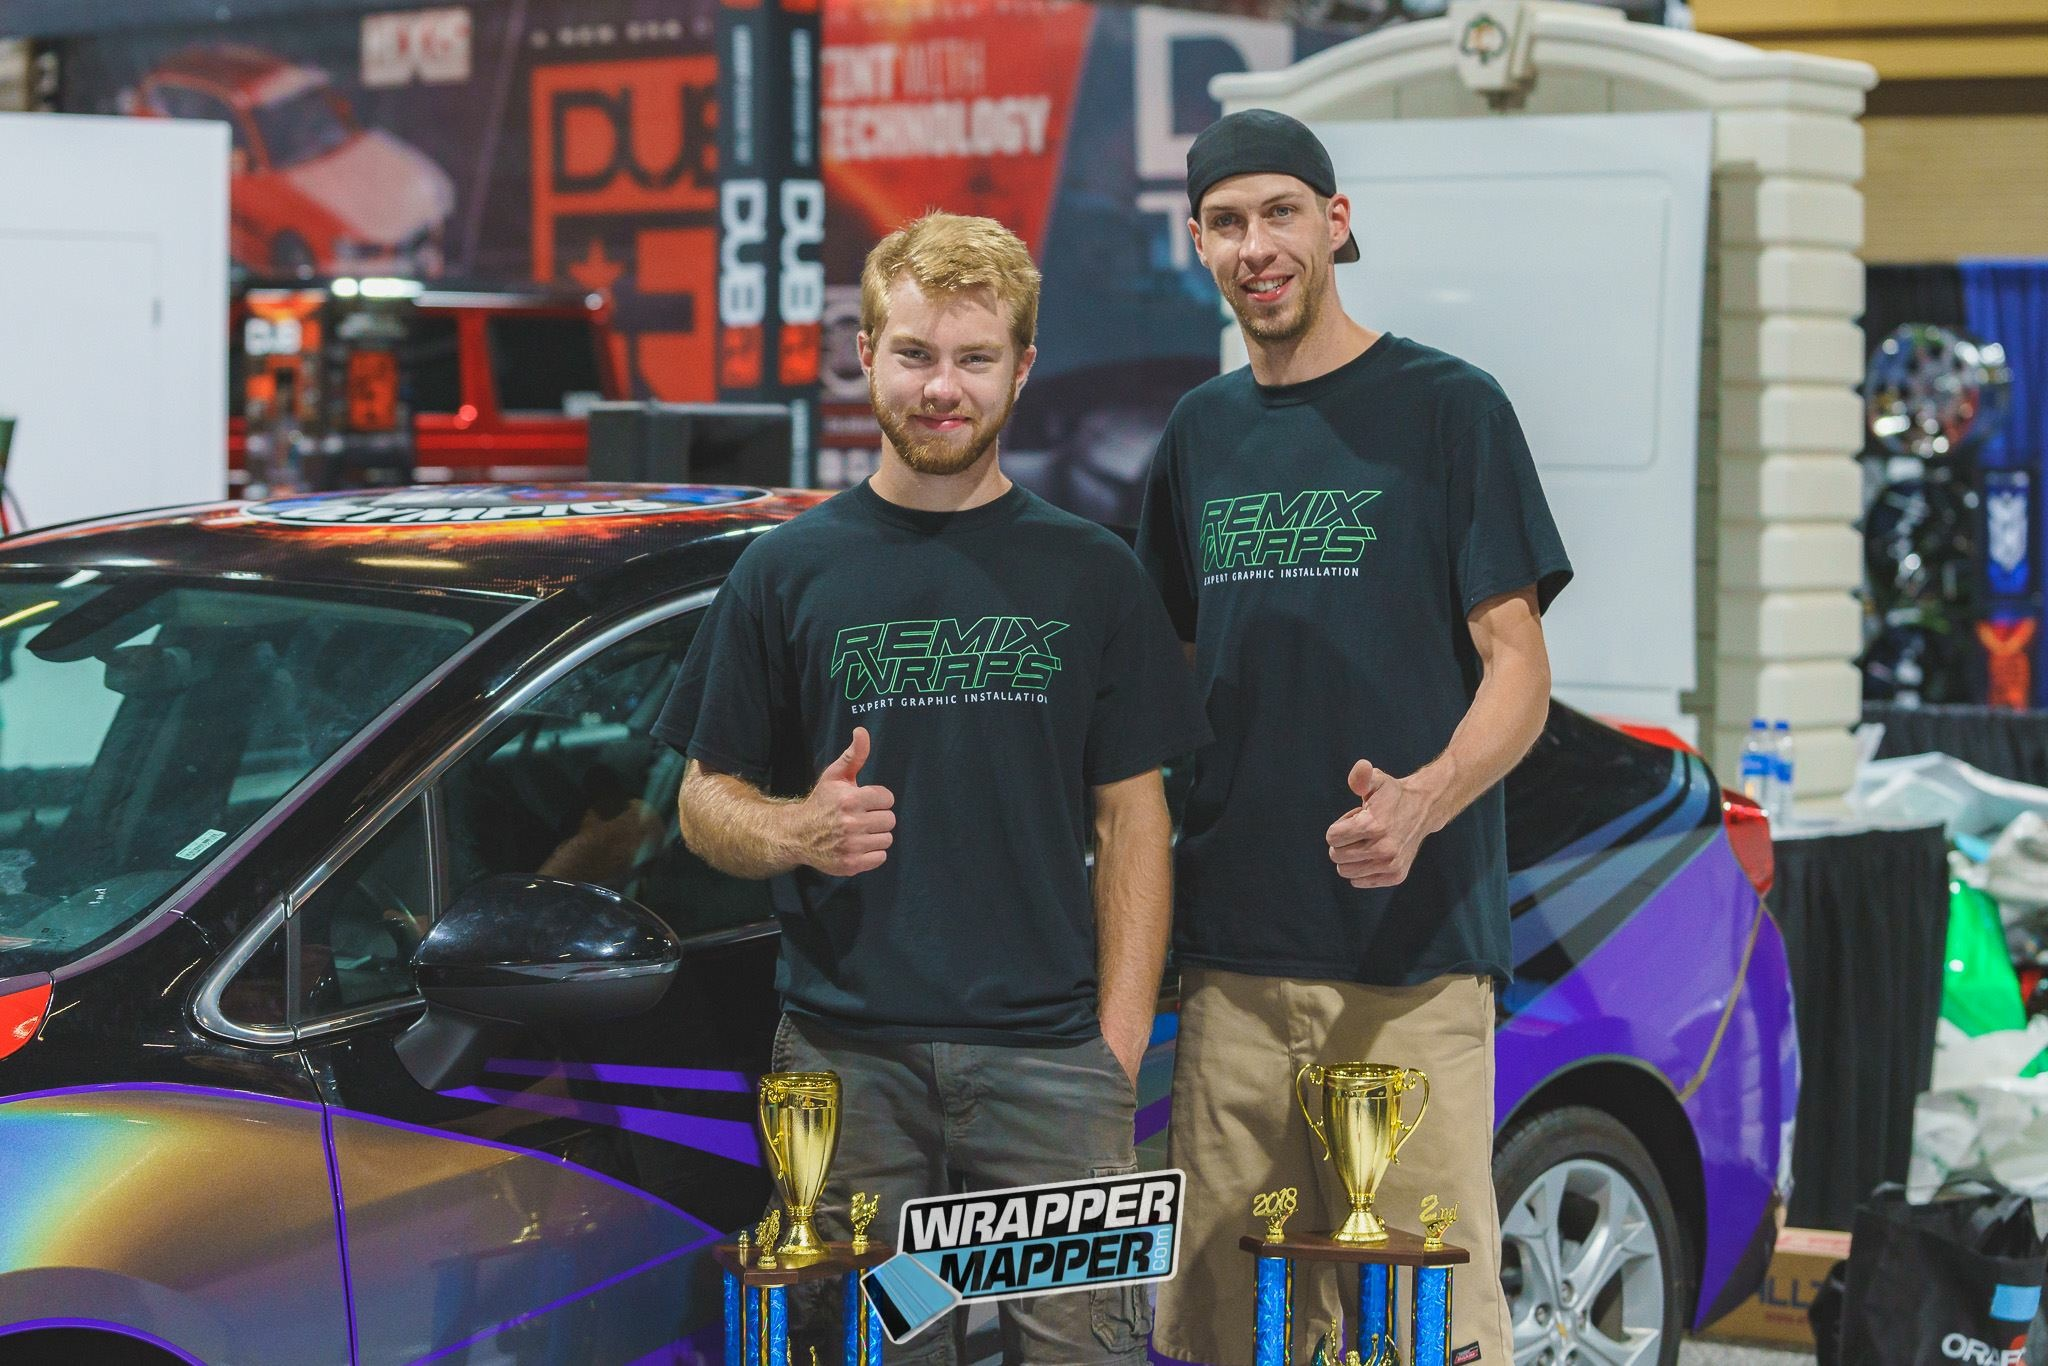 Team Remix - 2018 Wrapscon Wrap Olympics 2nd Place